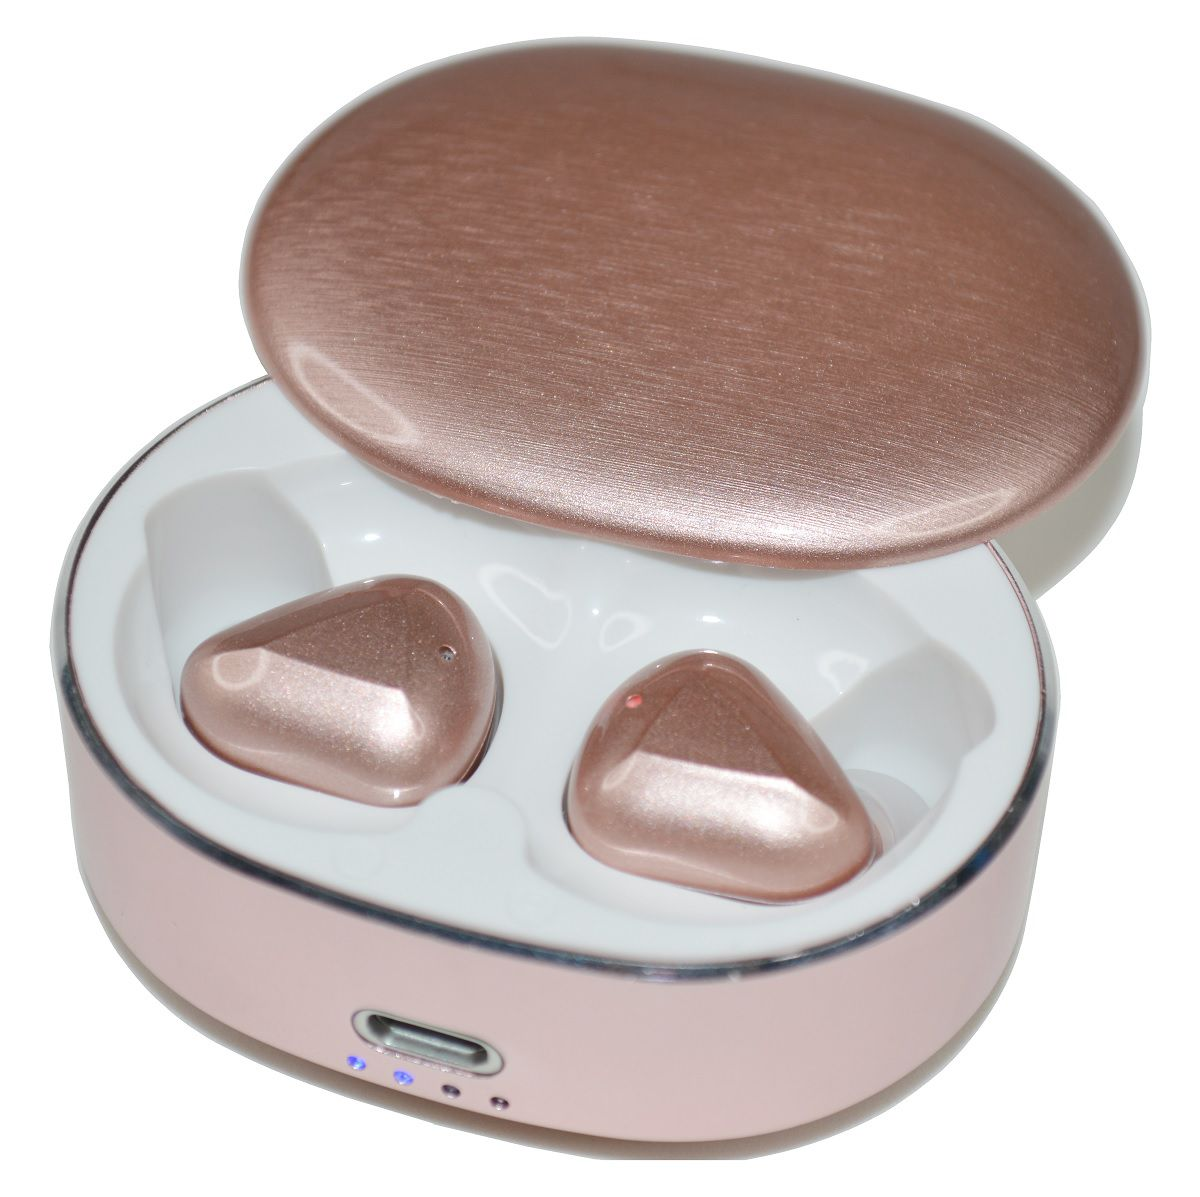 Fone De Ouvido Bluetooth Touch Duplo Sem Fio - T50